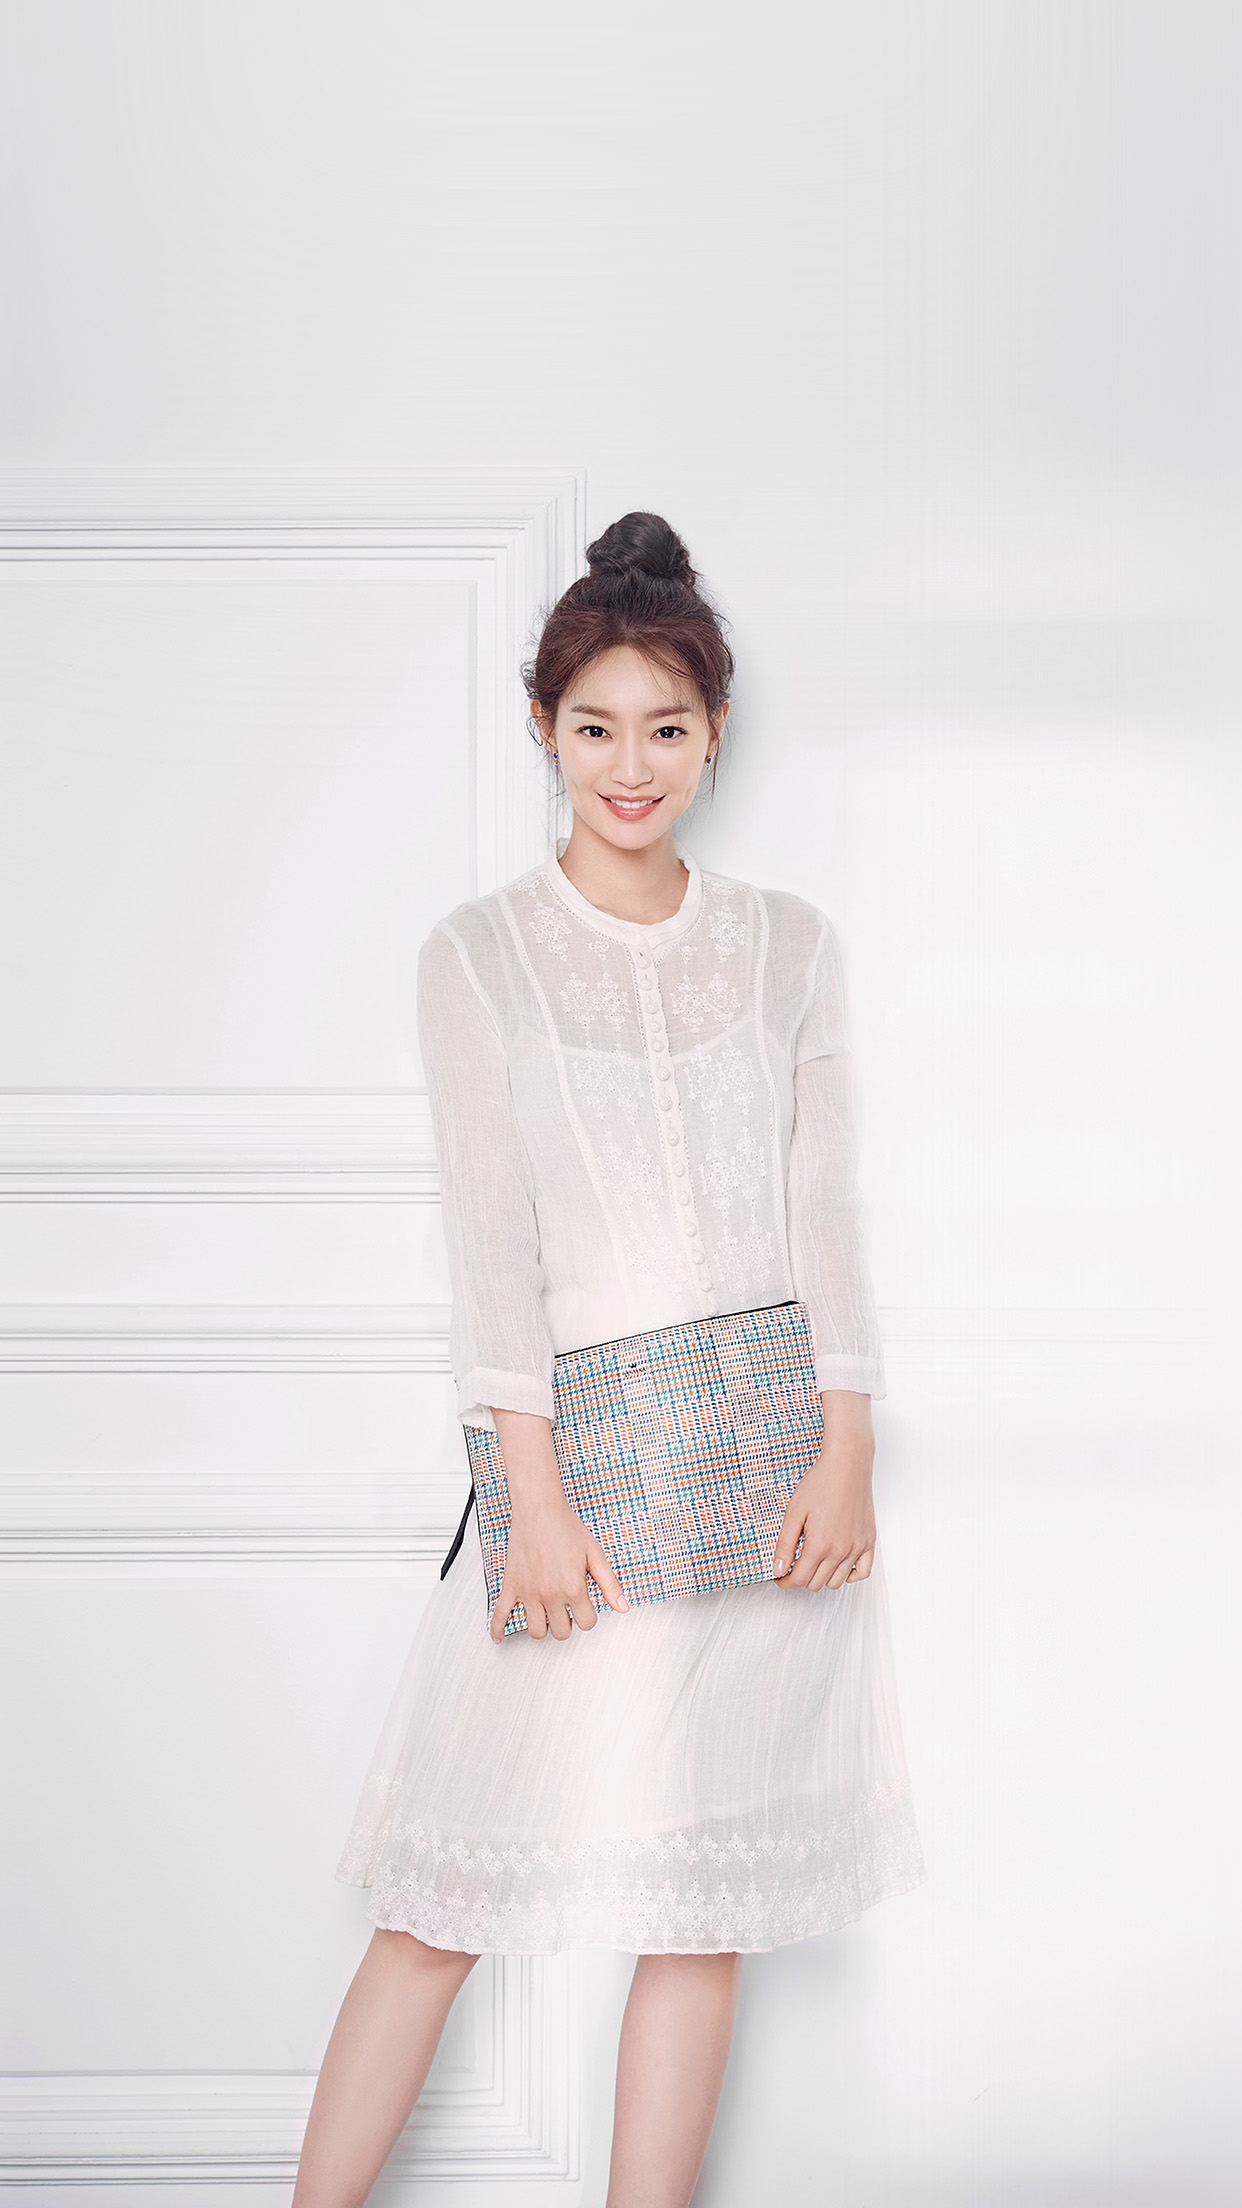 Iphone 5 Korean Girl Wallpaper Papers Co Iphone Wallpaper Ho32 Kpop Girl White Asian